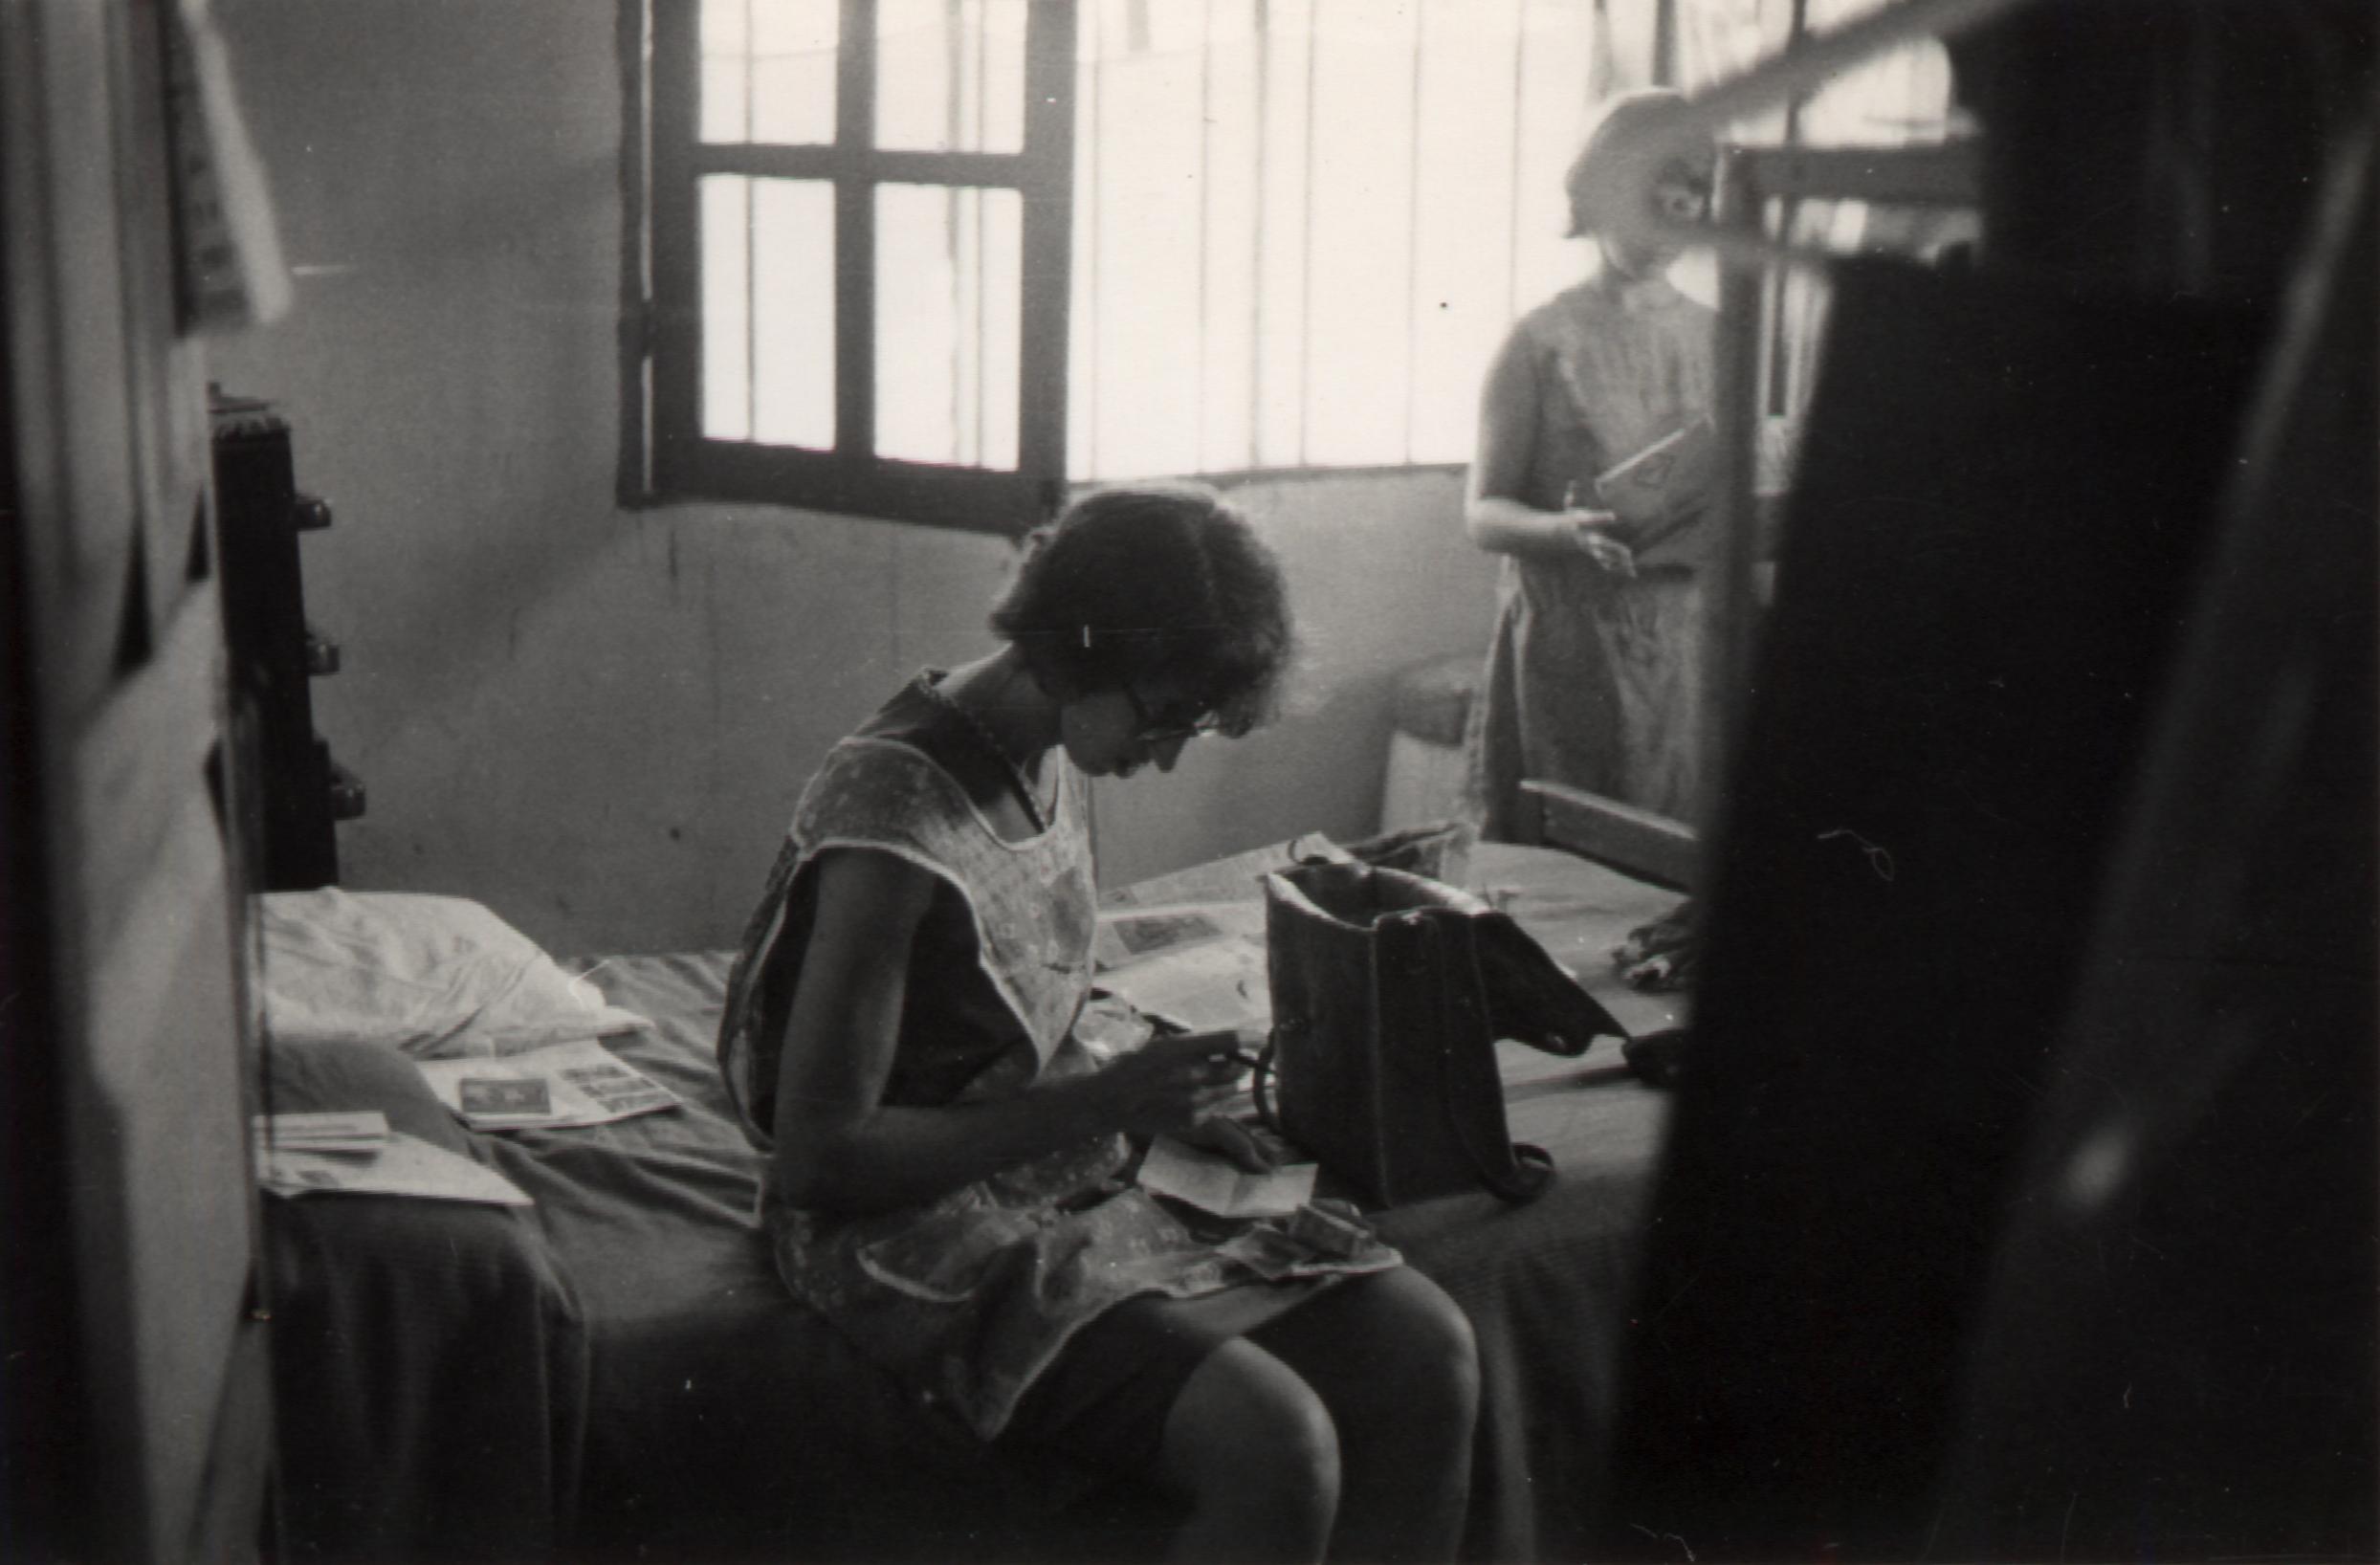 Jean writing check